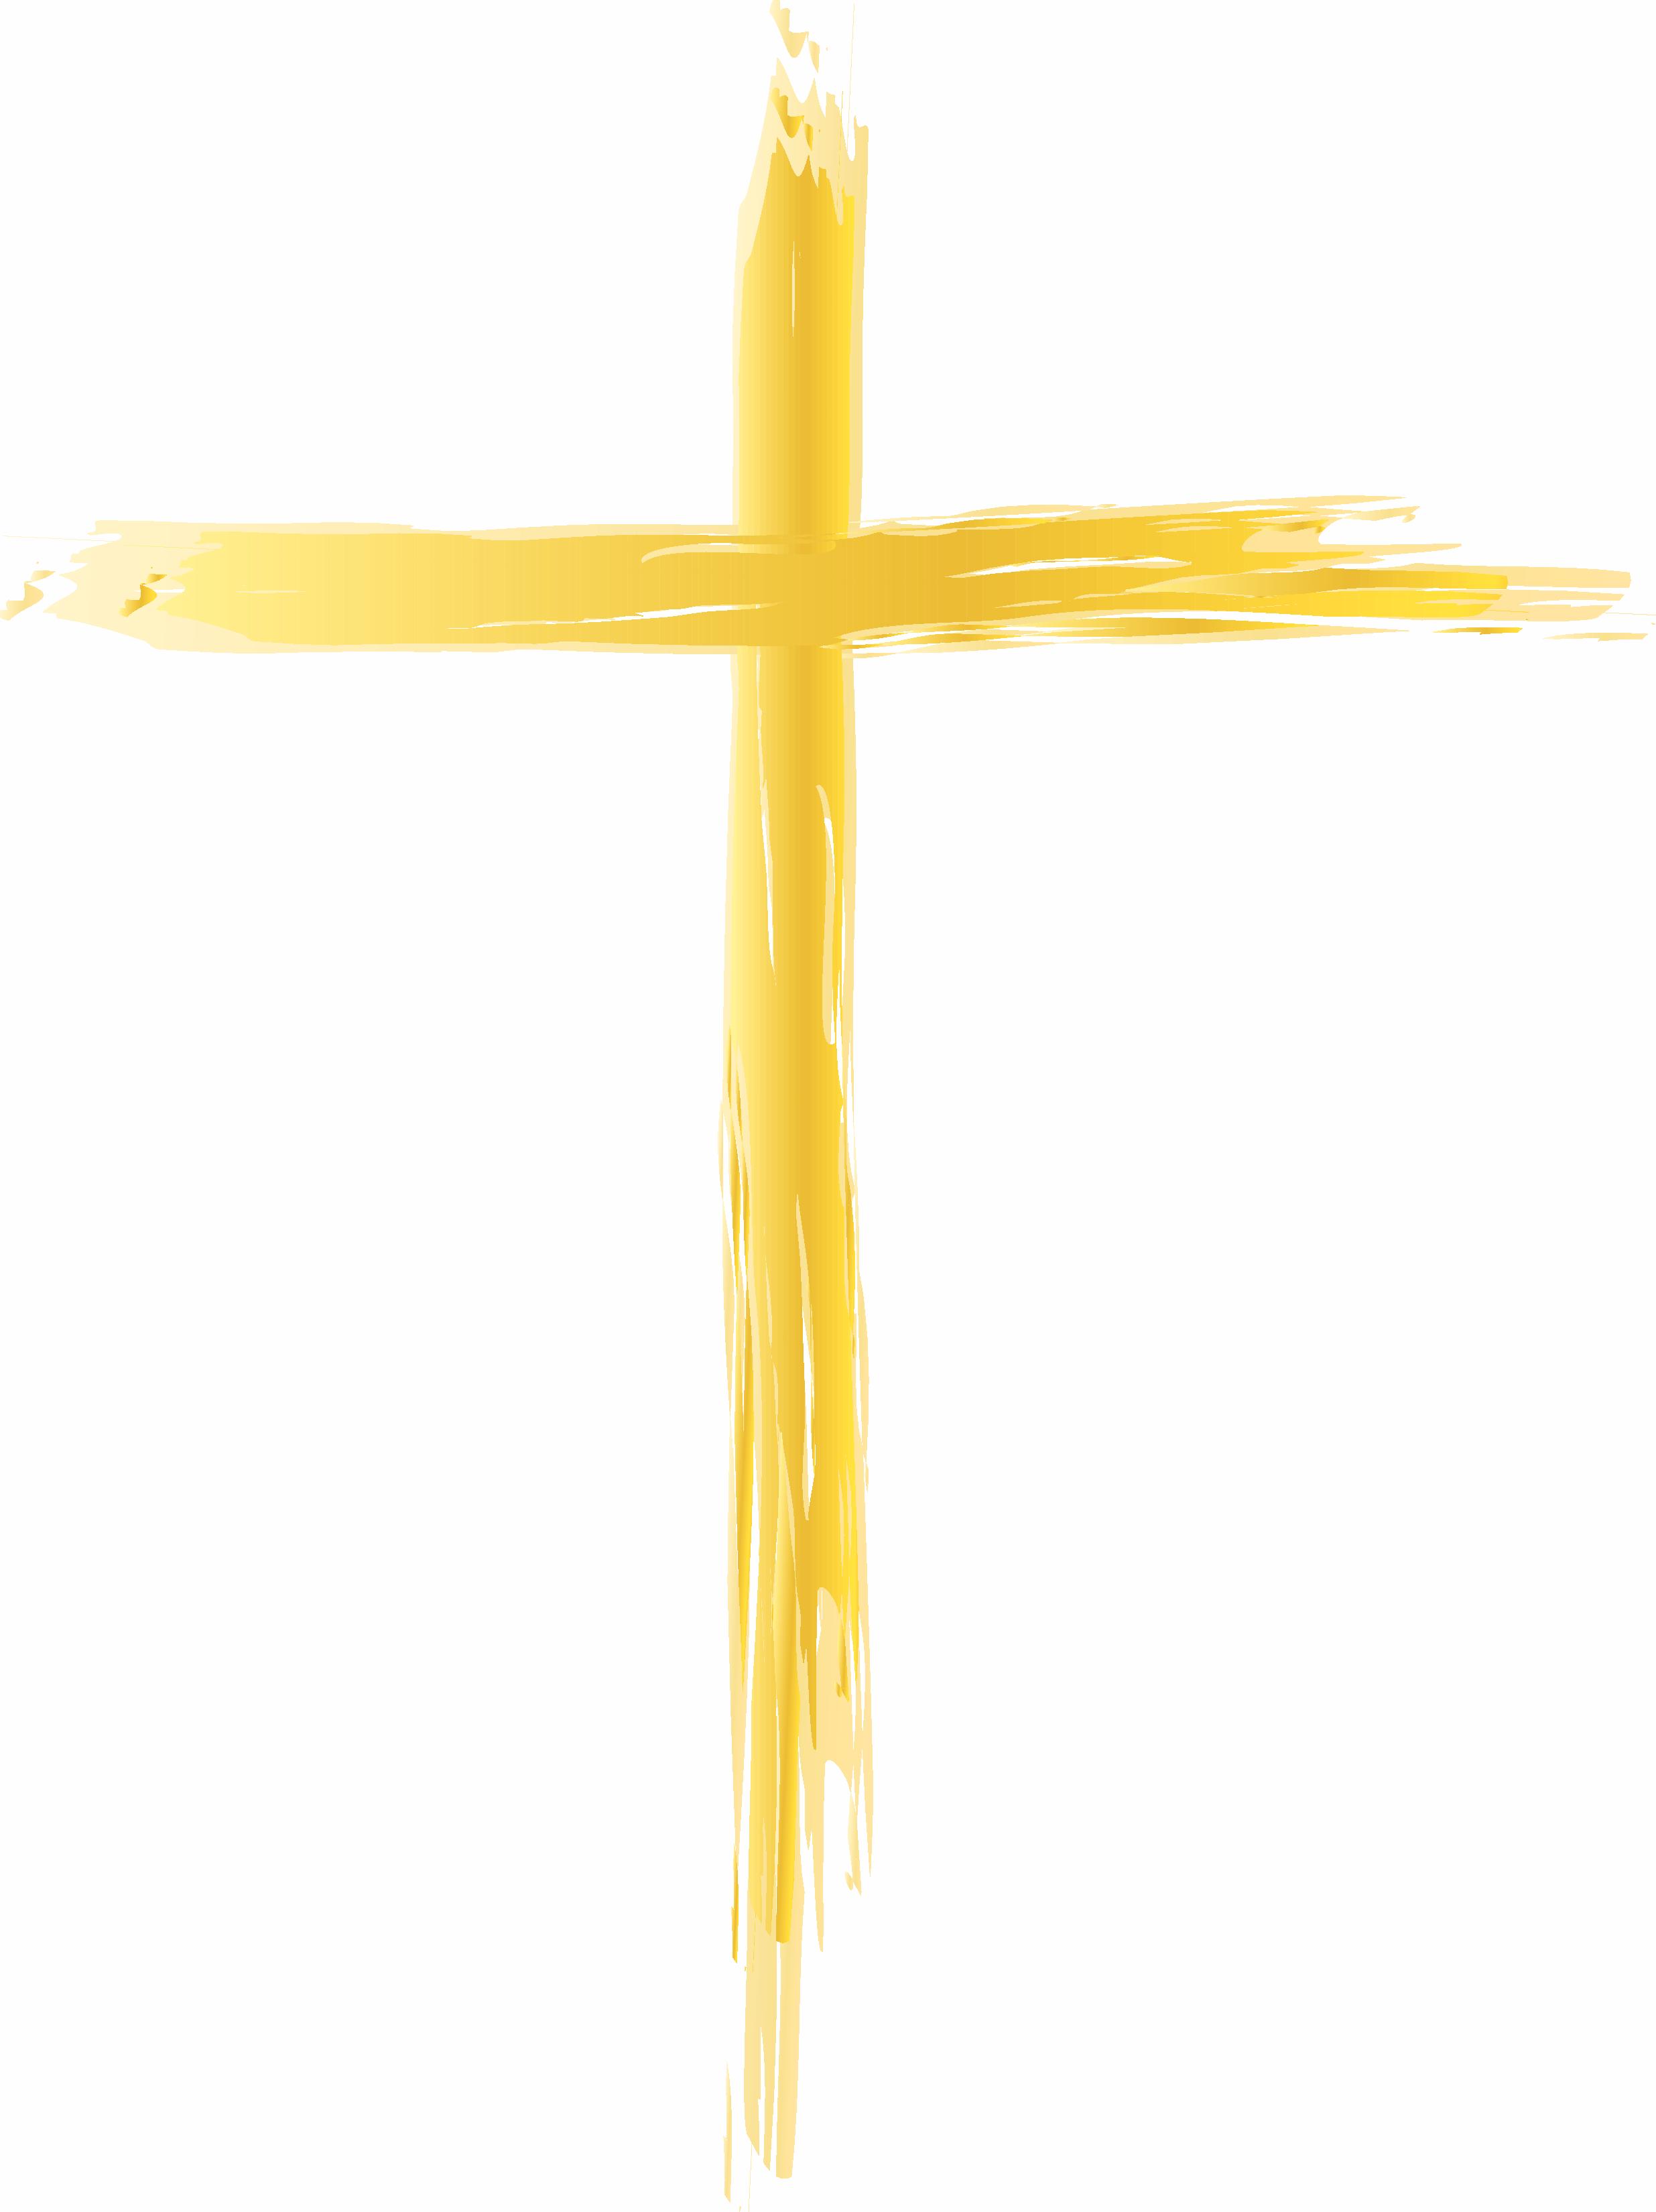 Baptist church cross clipart clipart suggest for Cross clipart